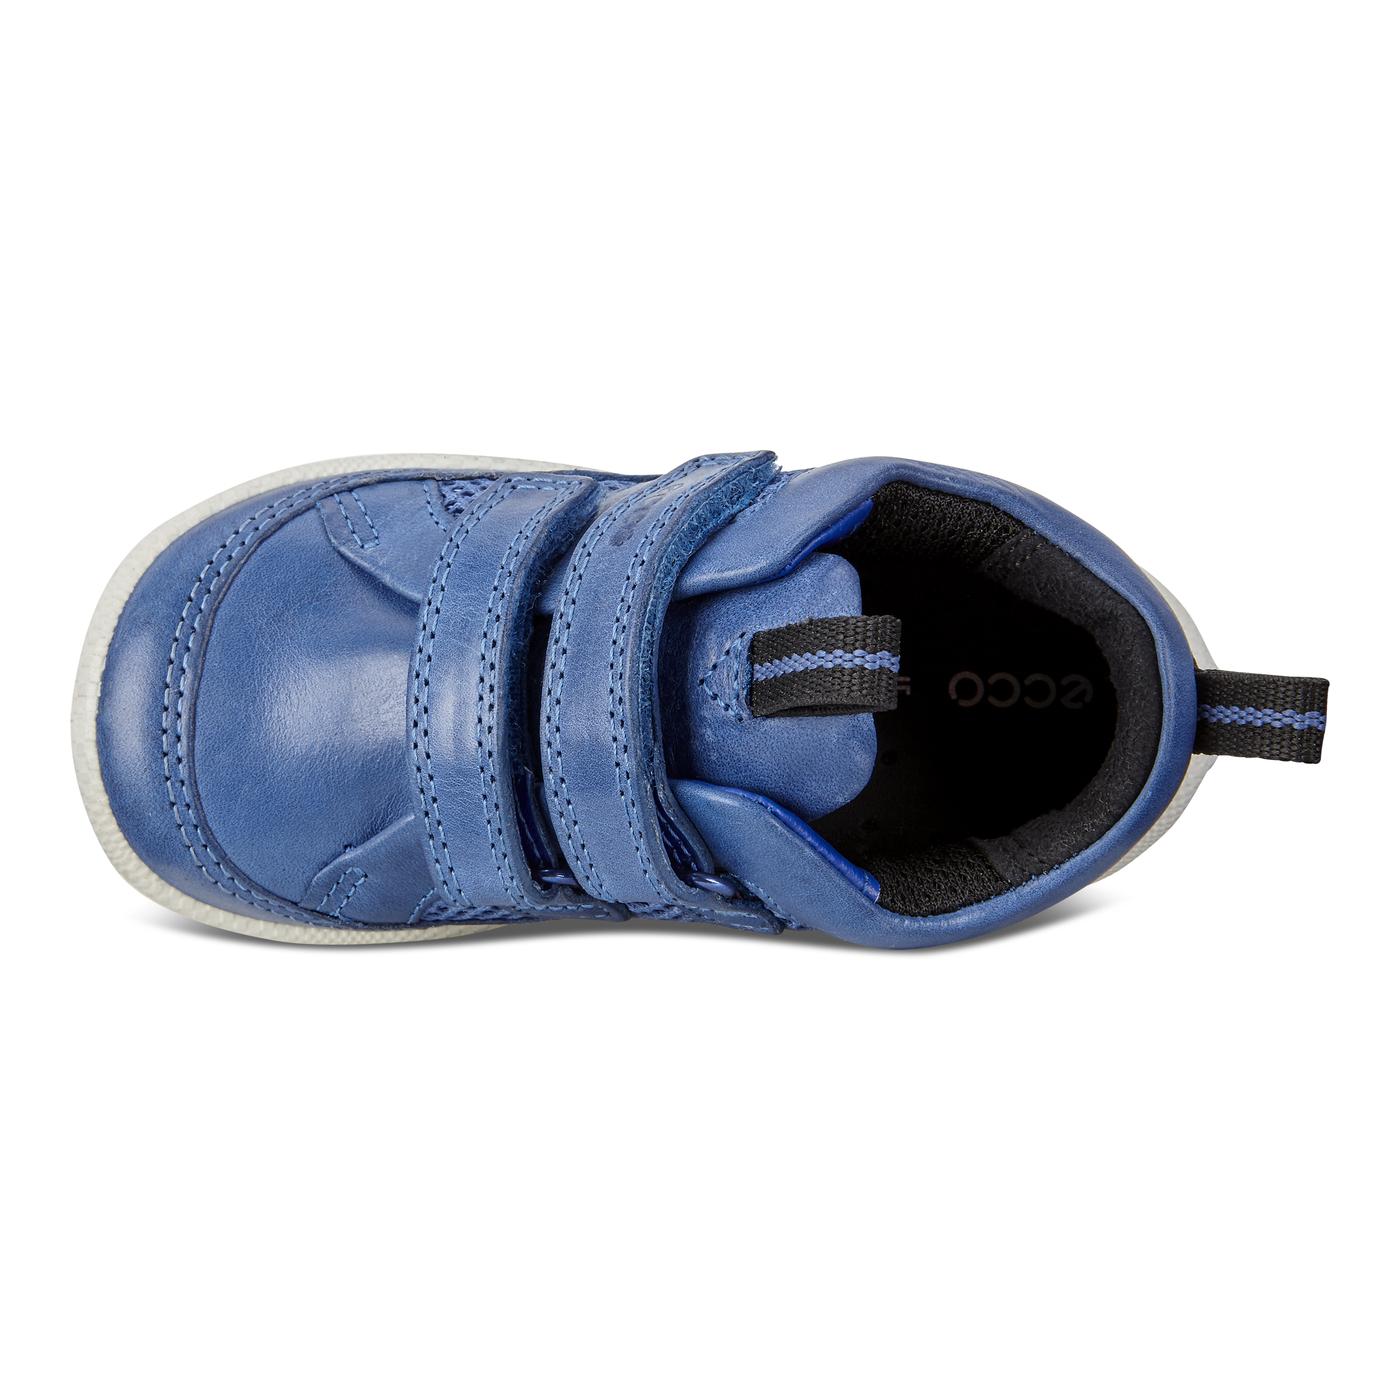 ECCO BIOM LITE INFANTS Velcro